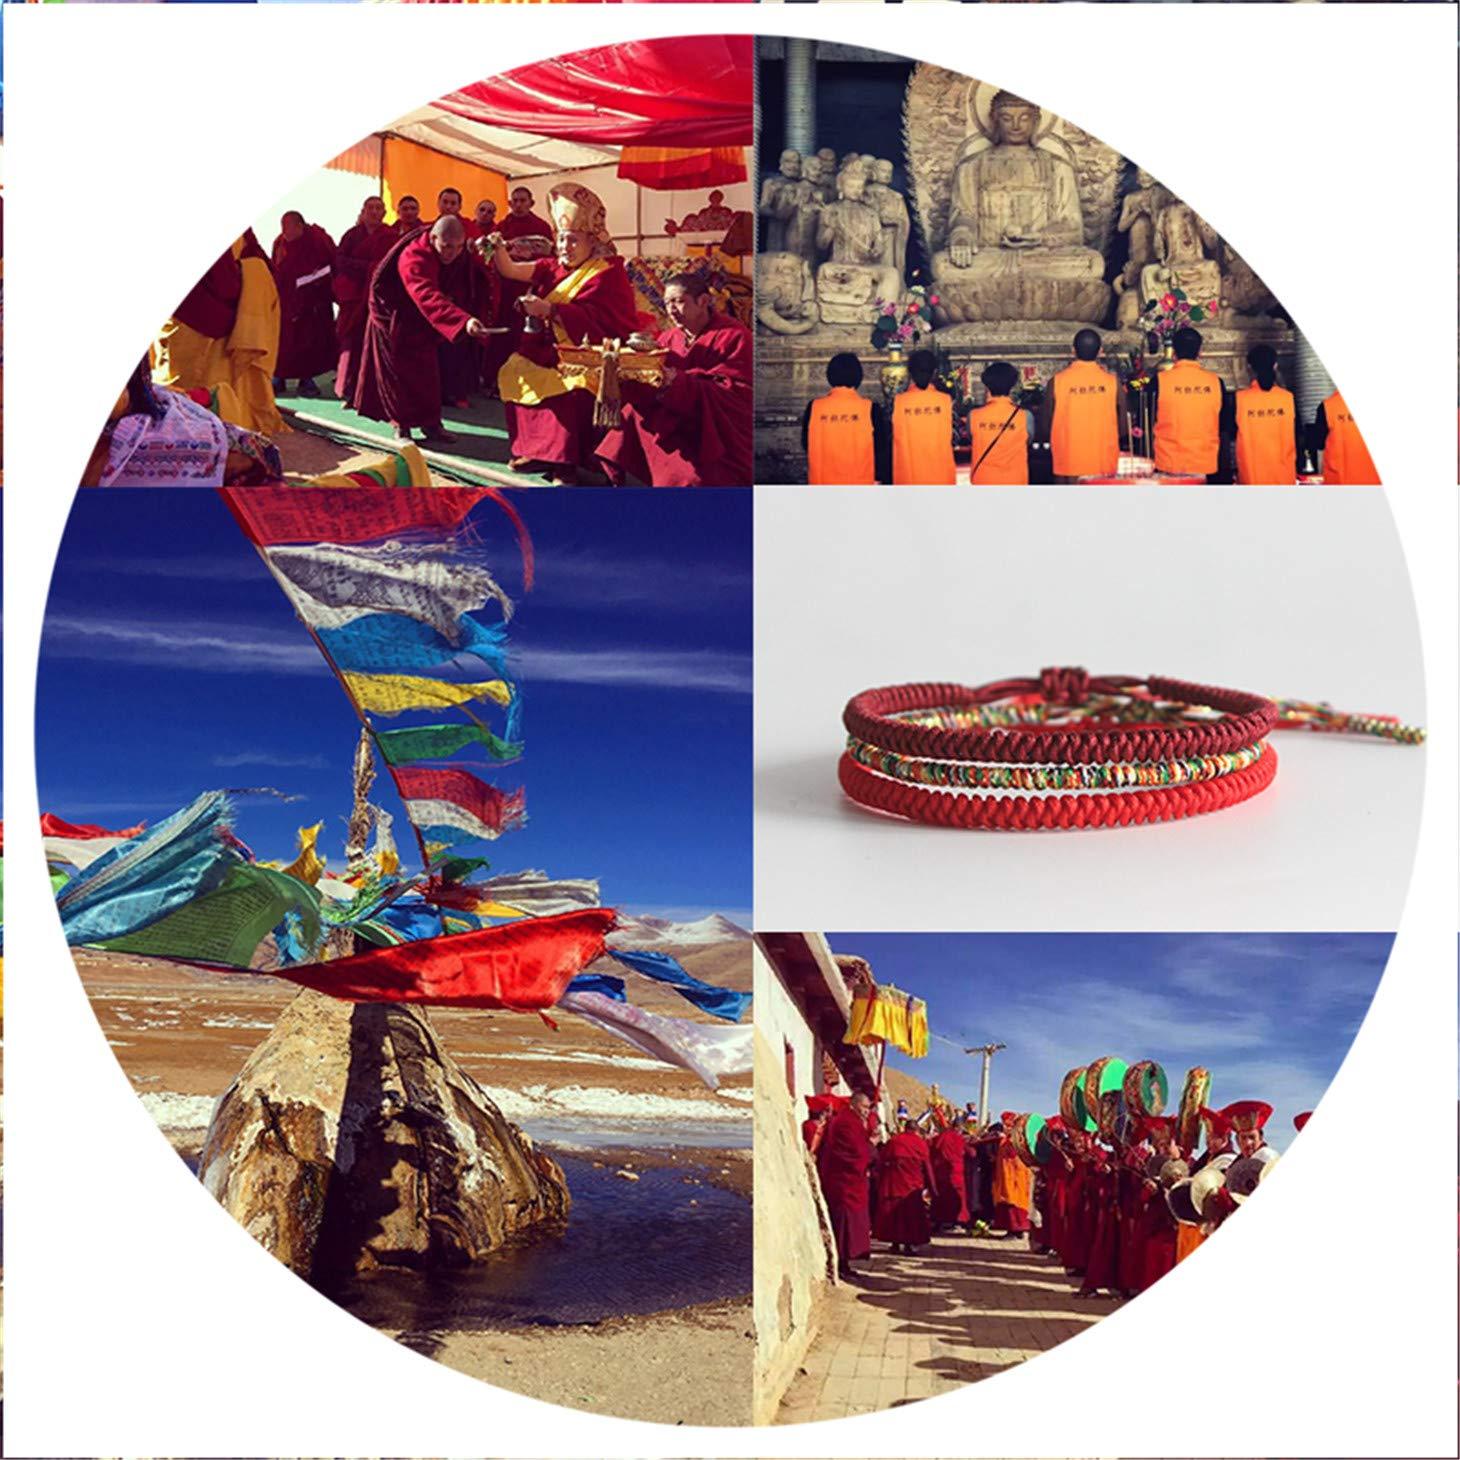 Olive Tayl 3PCS Multi Color Tibetan Buddhist Good Lucky Charm Tibetan Bracelets & Bangles for Women Men Handma by Olive Tayl (Image #4)